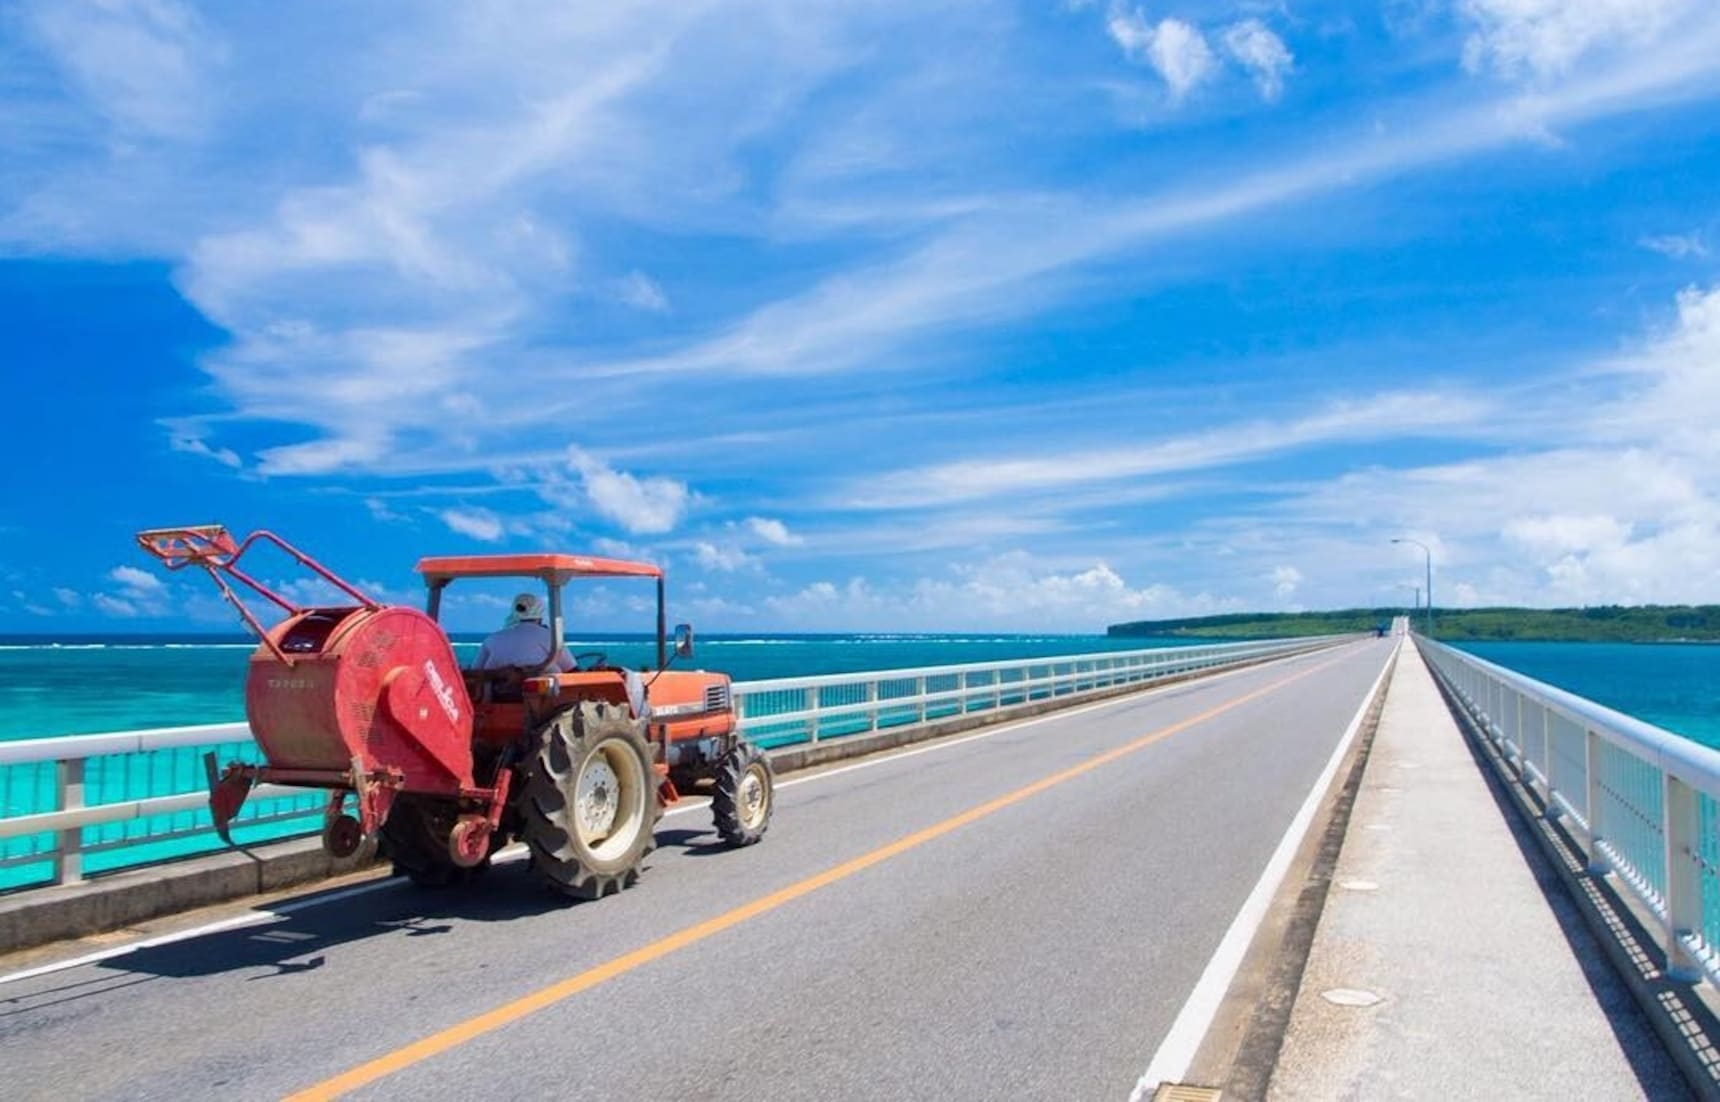 3 Bridges in Okinawa Offering Gorgeous Views